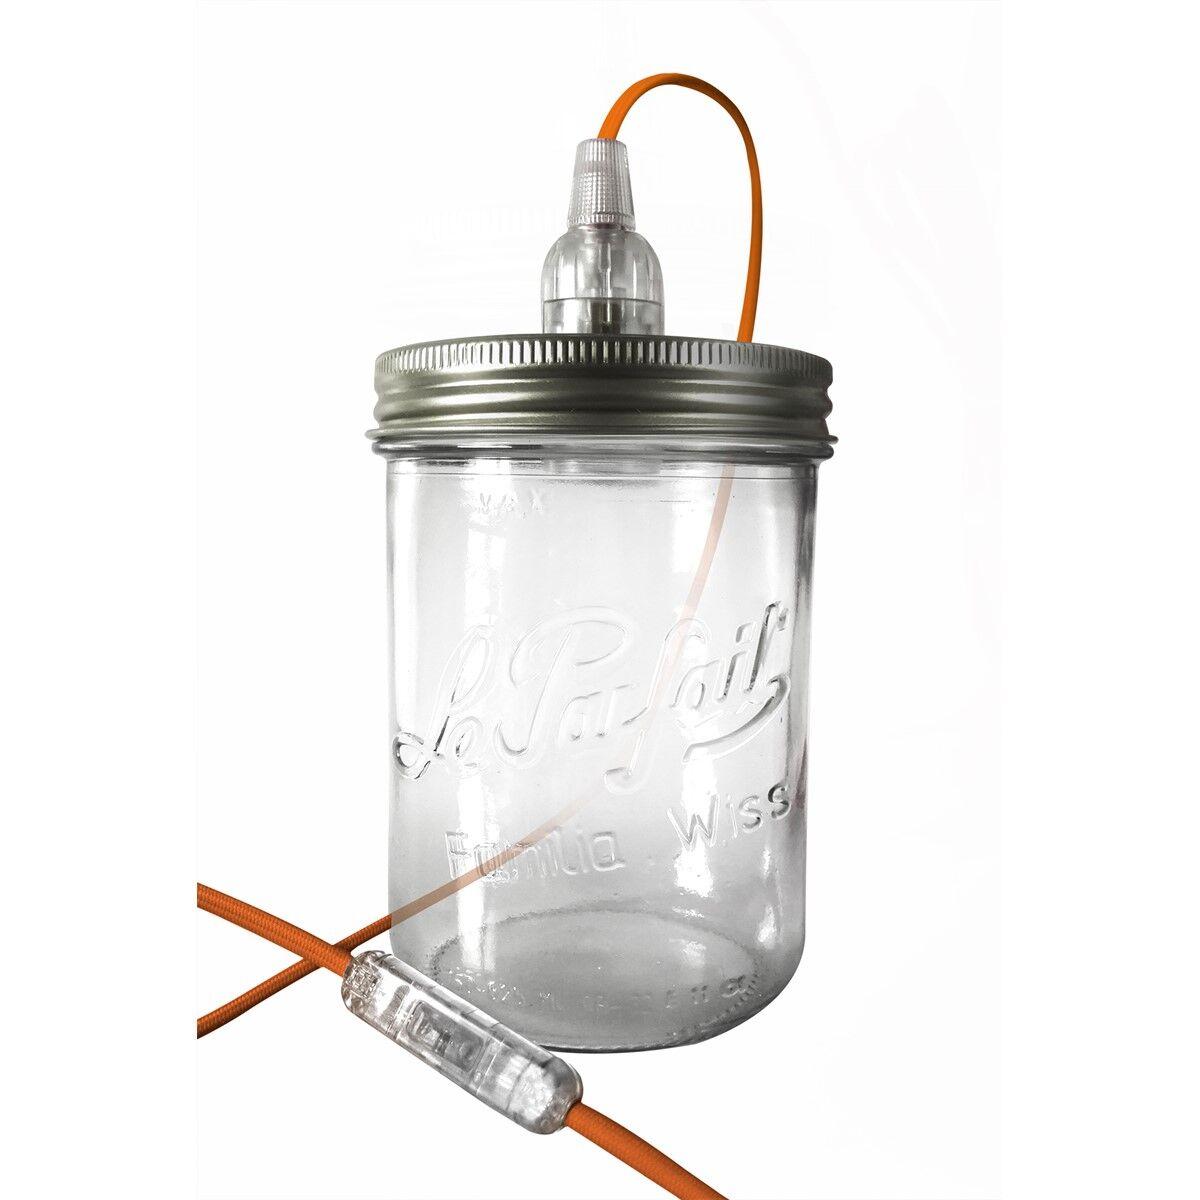 Fenel & Arno Lampe bocal en verre orange